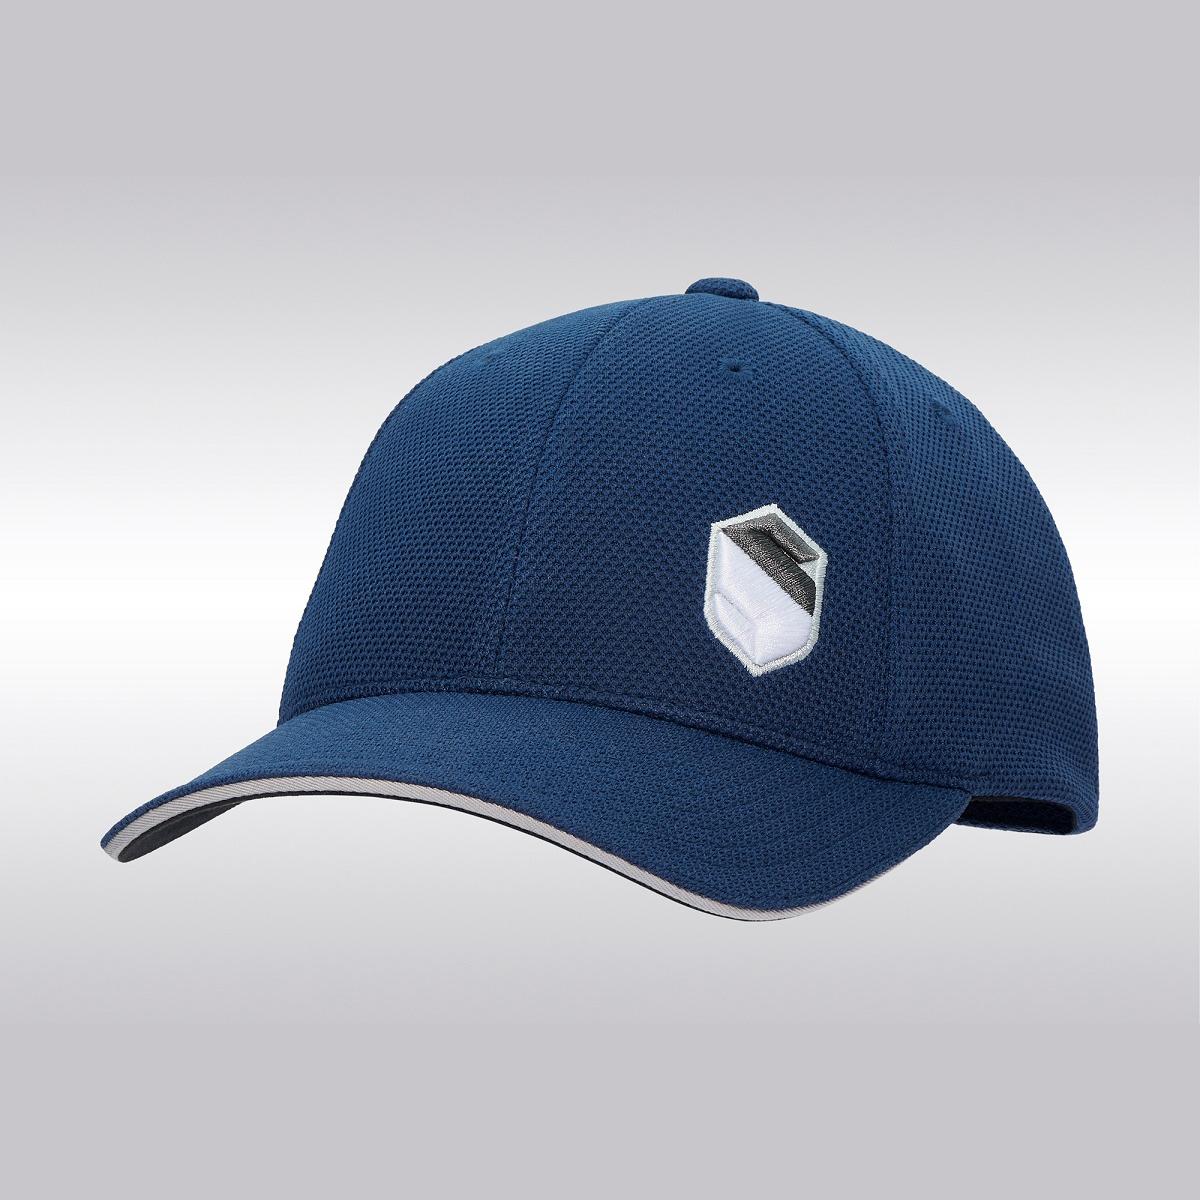 samshield baseball cap